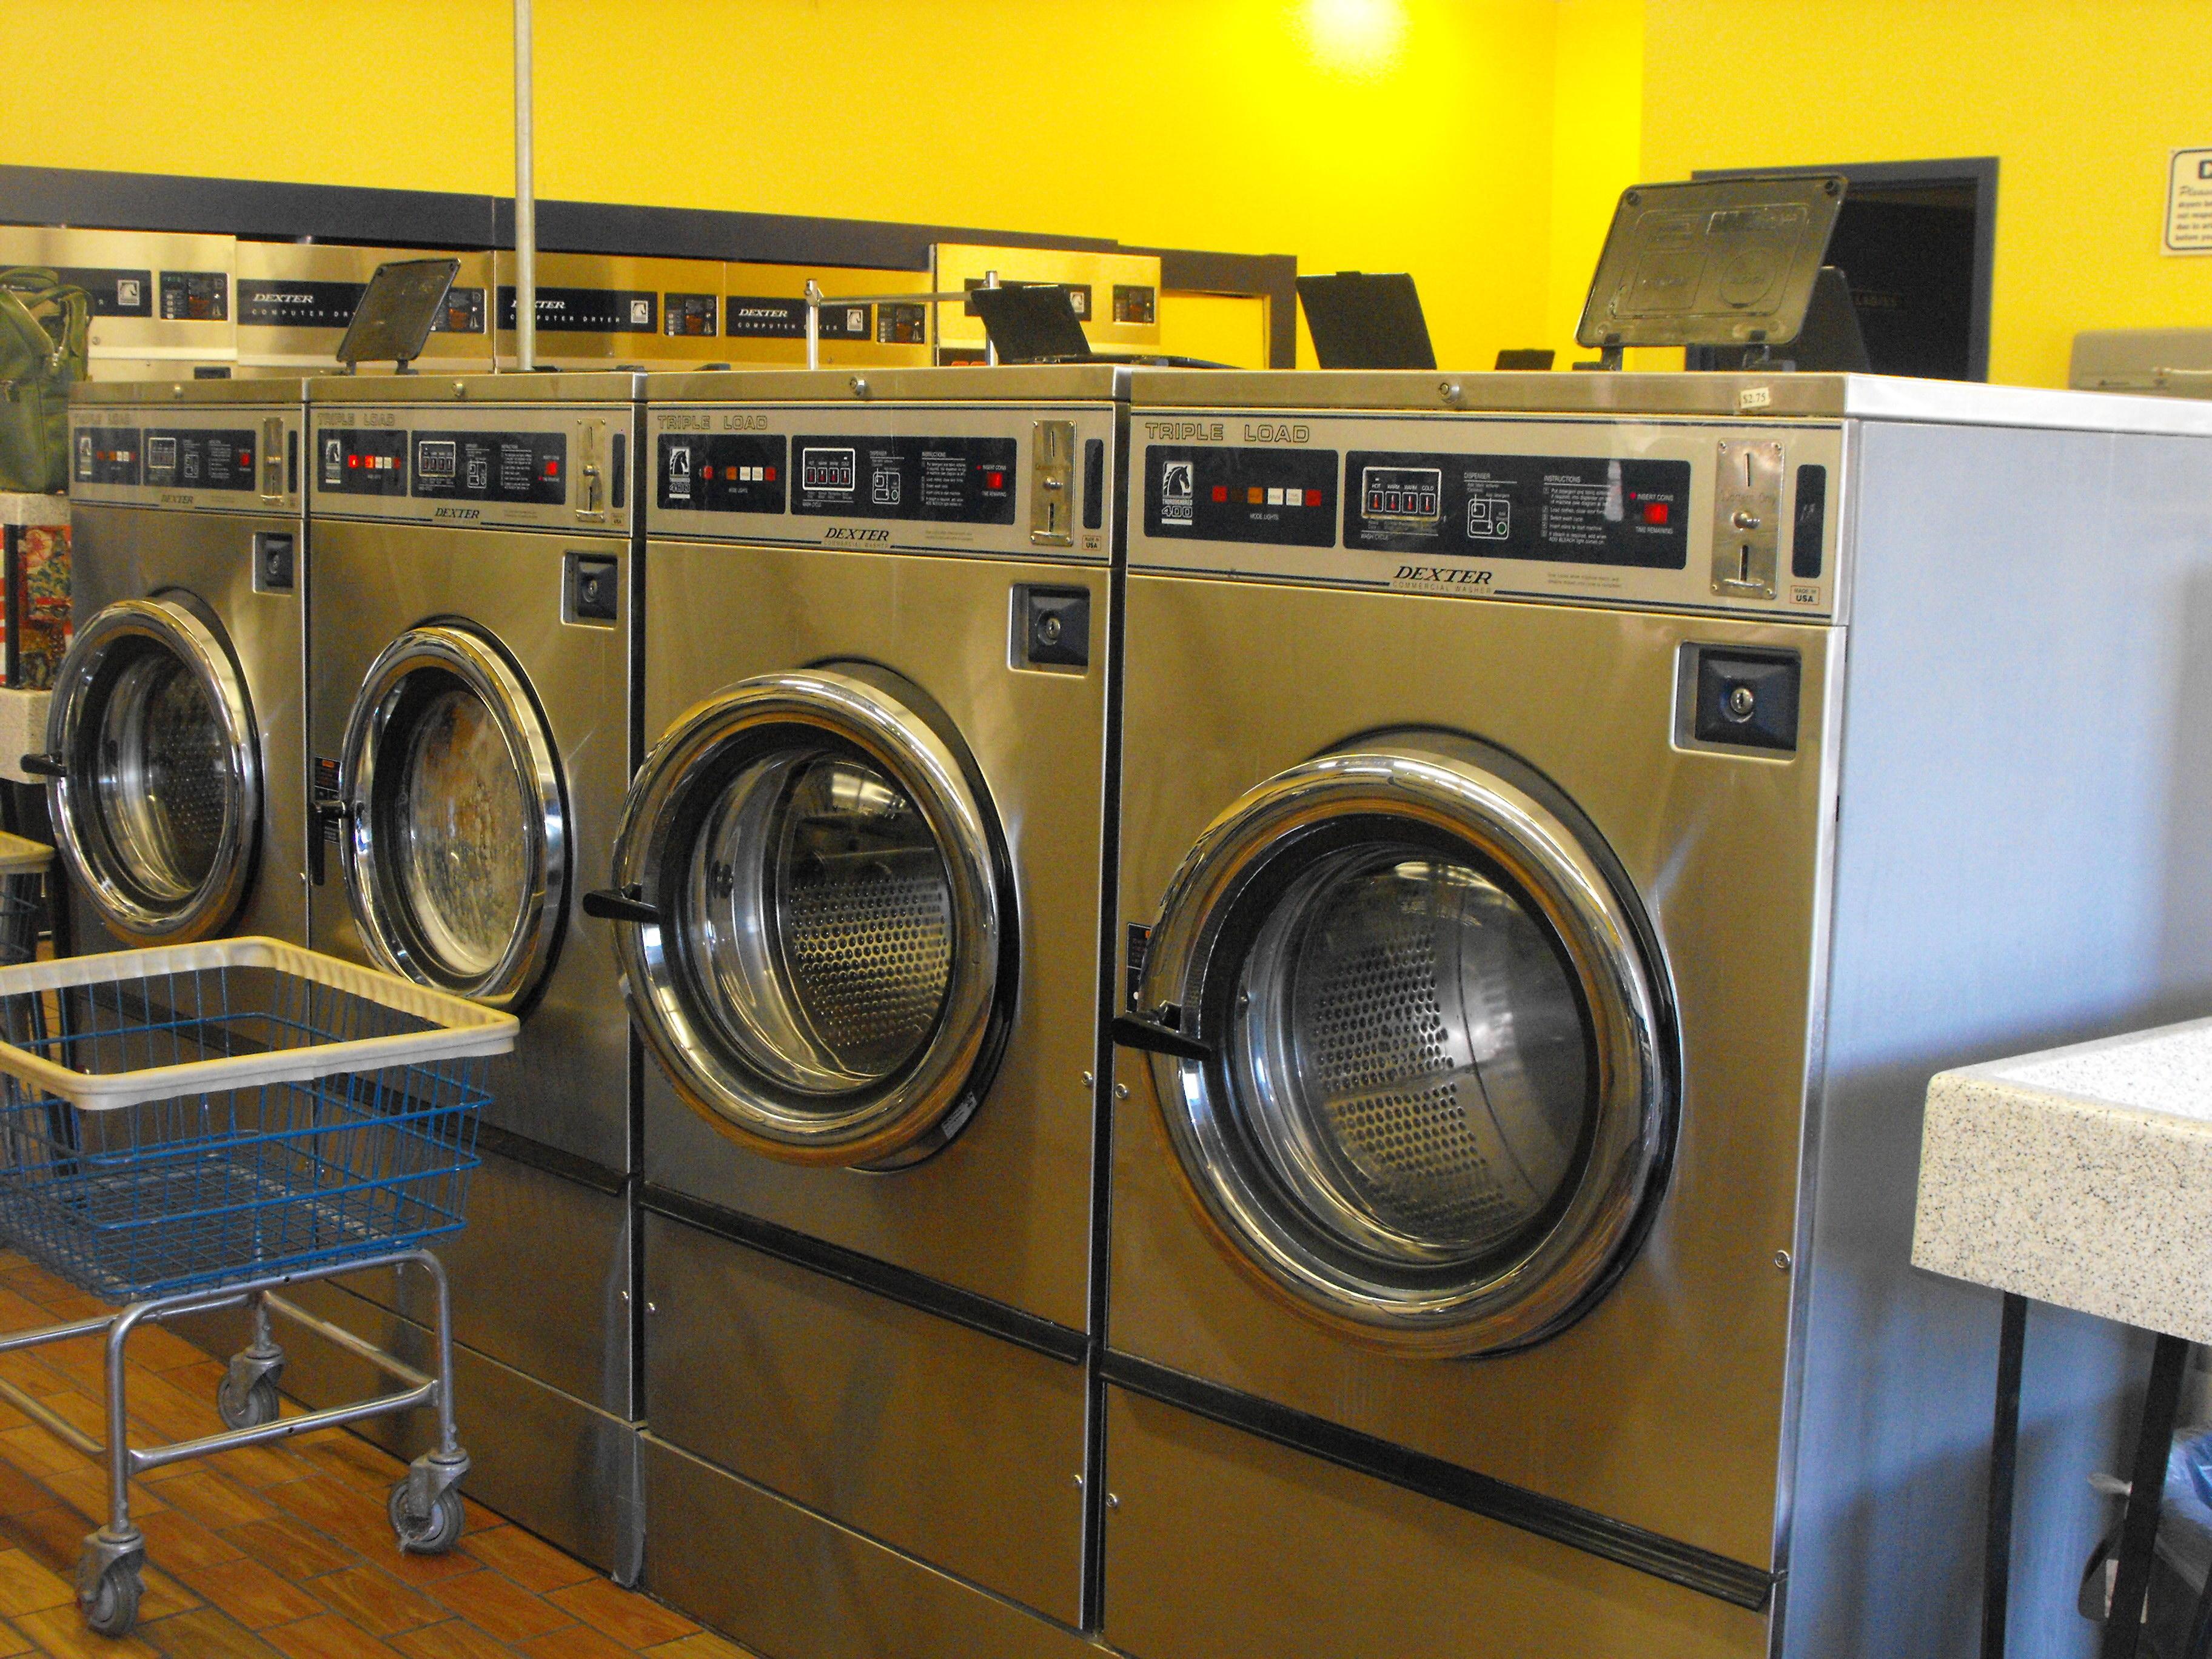 Vandalia Coin Laundry and Car Wash image 1